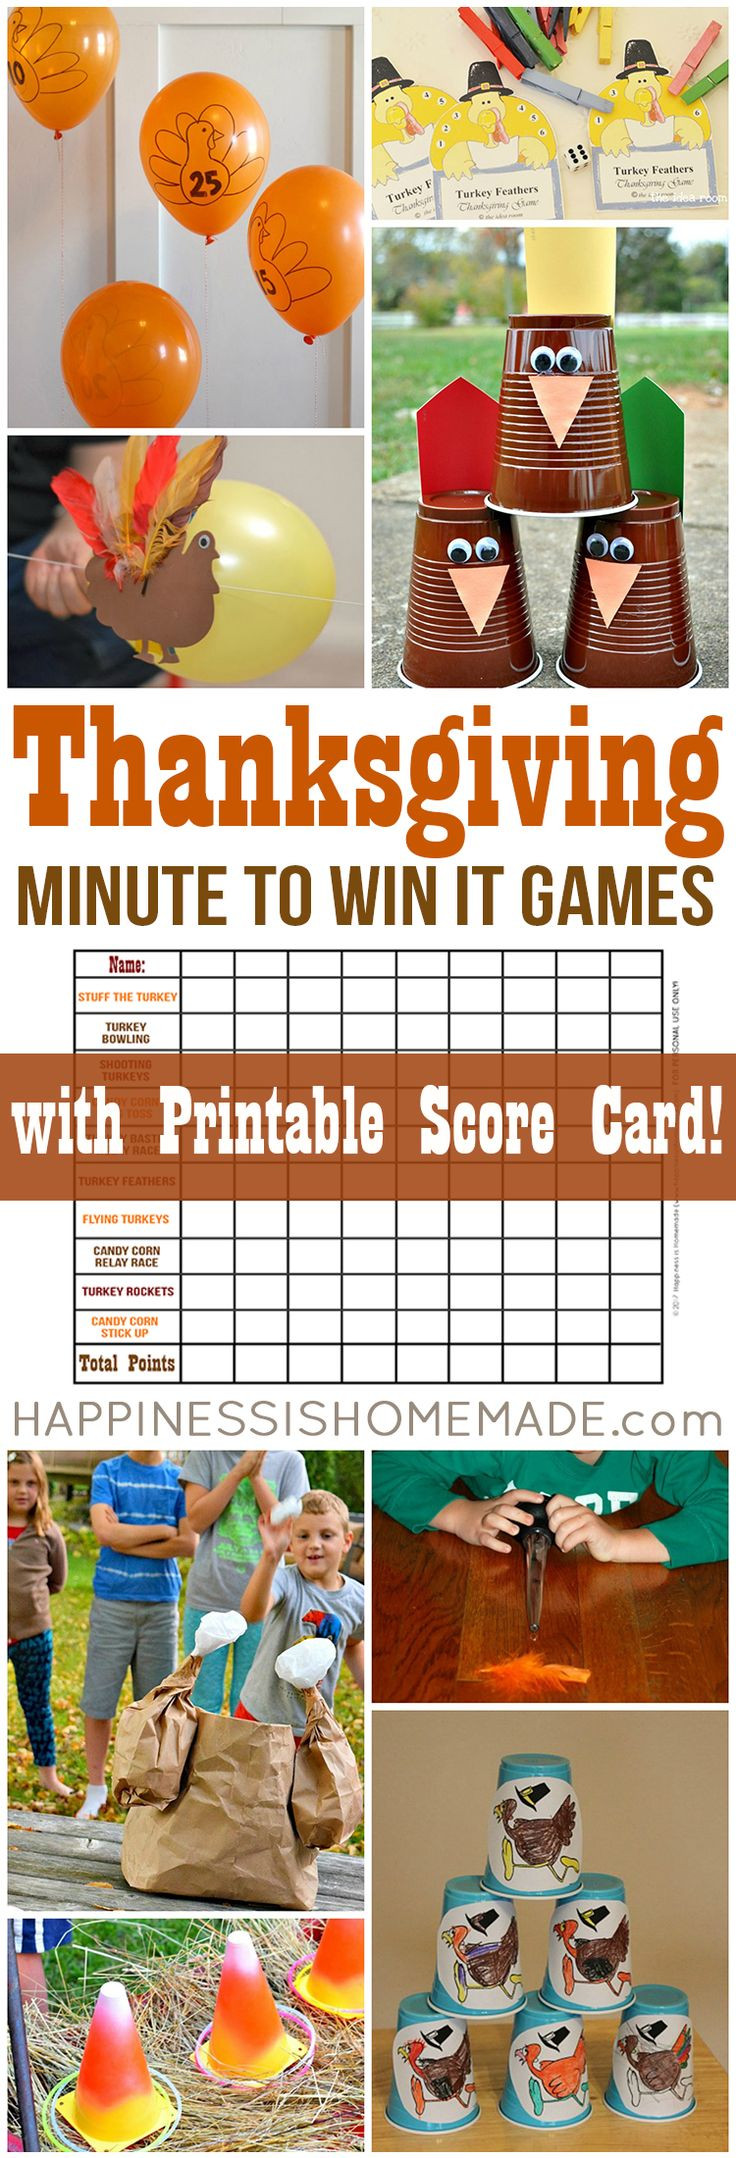 Thanksgiving Dinner Games  Best 25 Dinner party games ideas on Pinterest